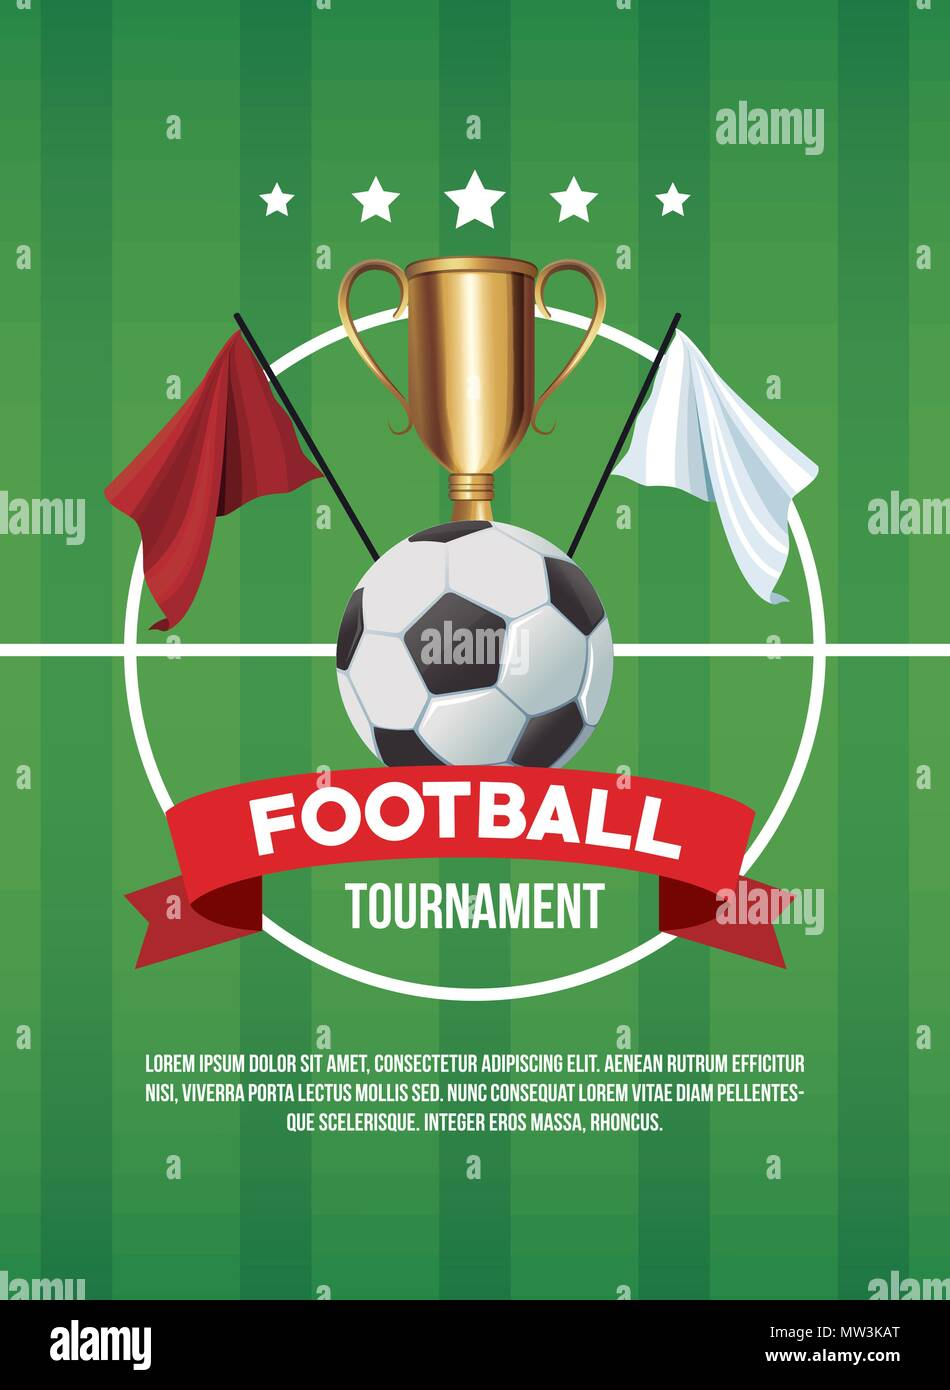 Football Tournament Banner Stock Vector Image Art Alamy